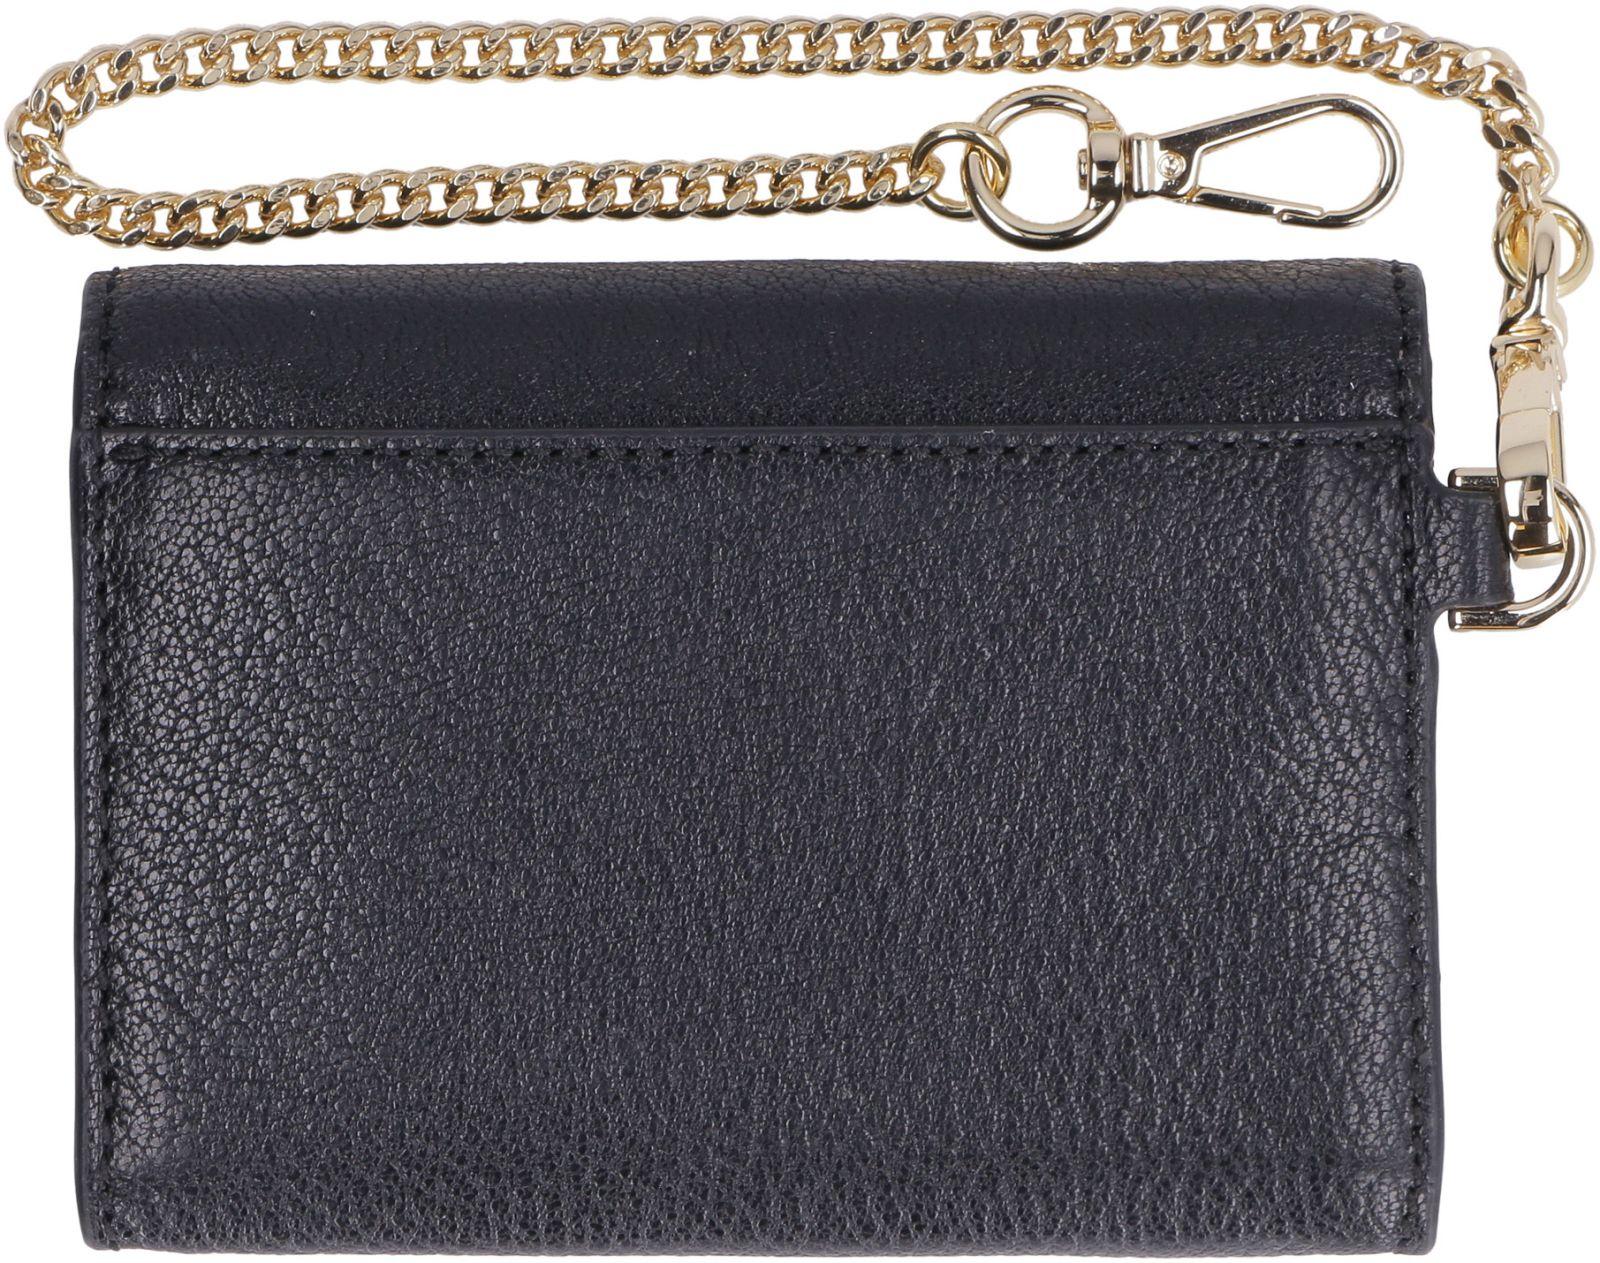 8cb3fdd8b70d ... Michael Kors Money Pieces Small Flap-over Leather Wallet - black ...